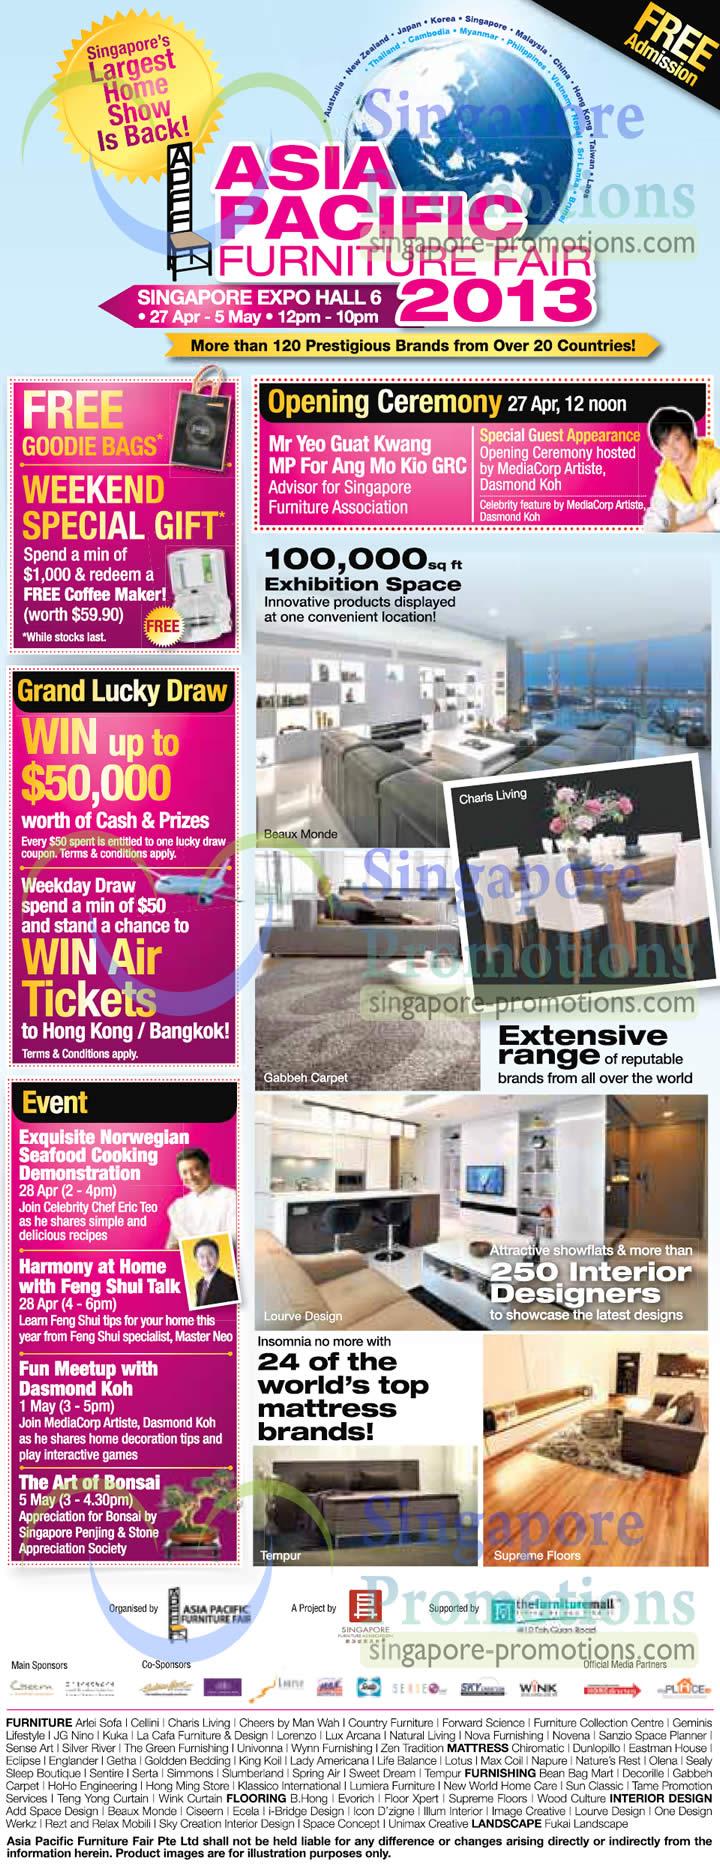 Asia Pacific Furniture Fair 25 Apr 2013